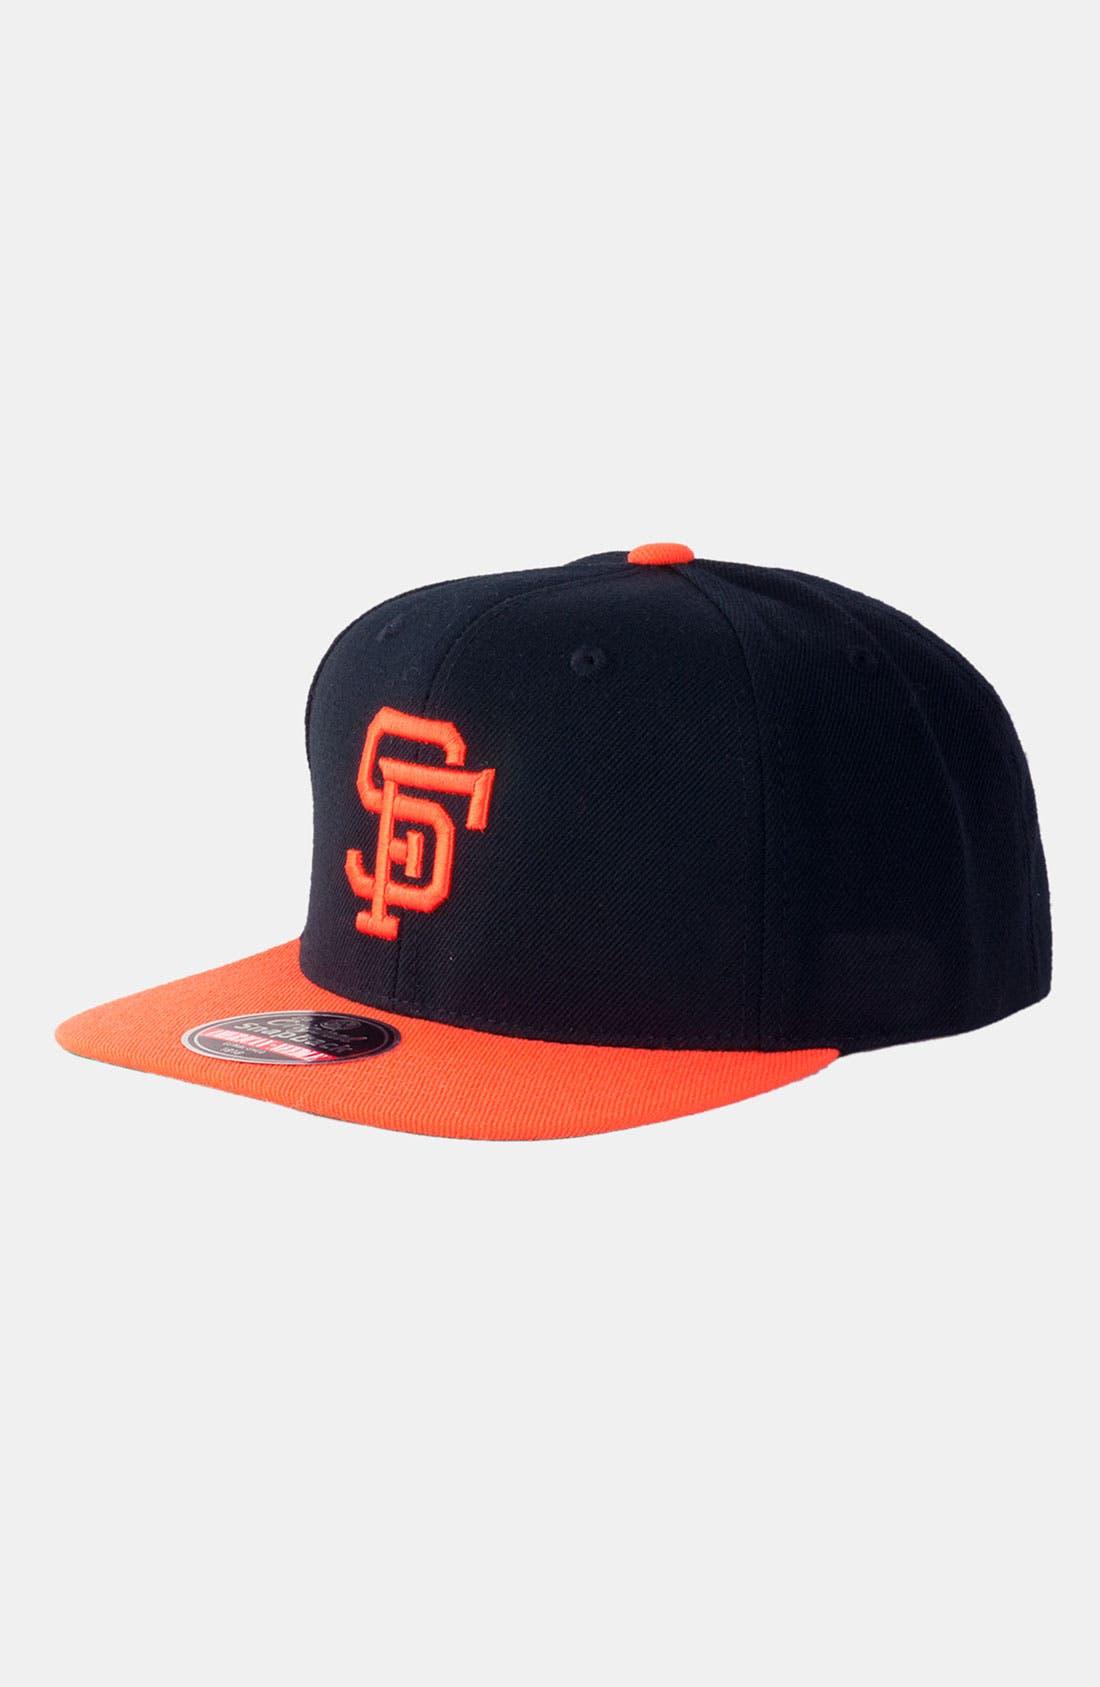 Alternate Image 1 Selected - American Needle 'San Francisco Giants - Cooperstown' Snapback Baseball Cap